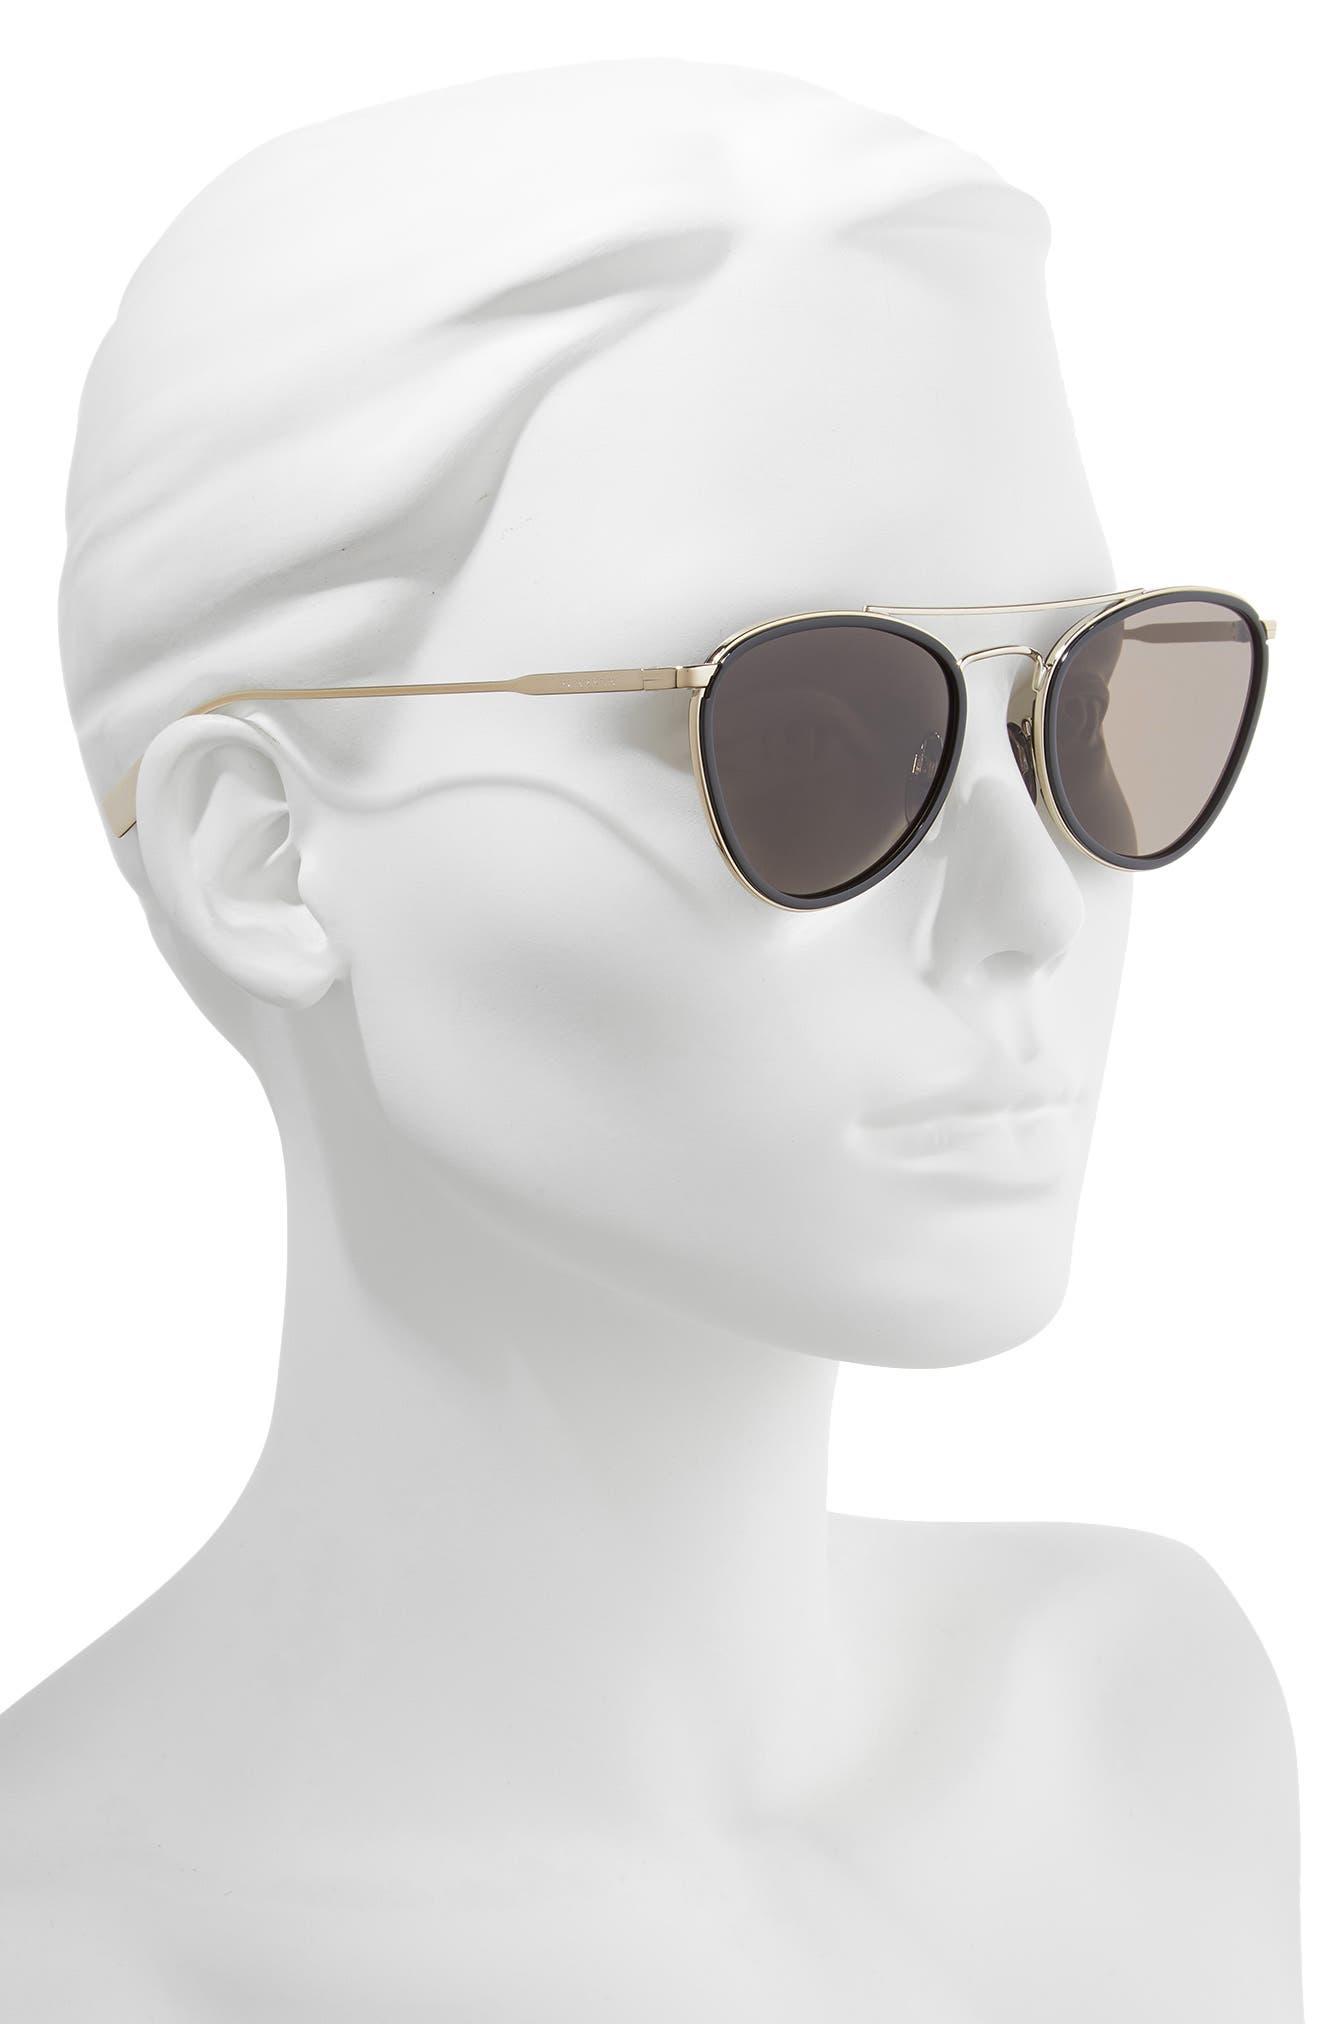 51mm Aviator Sunglasses,                             Alternate thumbnail 2, color,                             BLACK/ GOLD SOLID